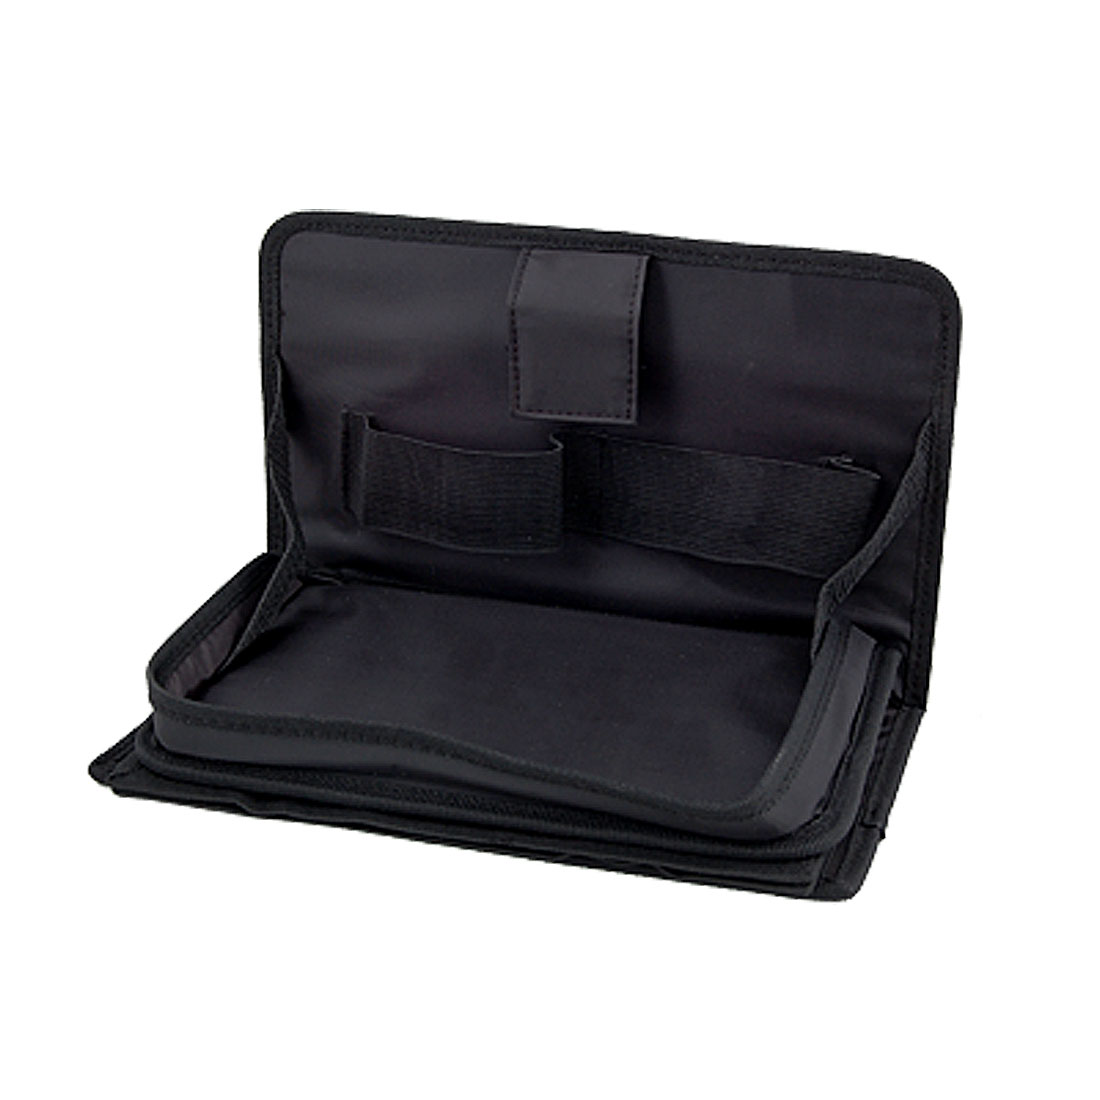 Auto Car Black Terylene Nylon Layered Folding Holder